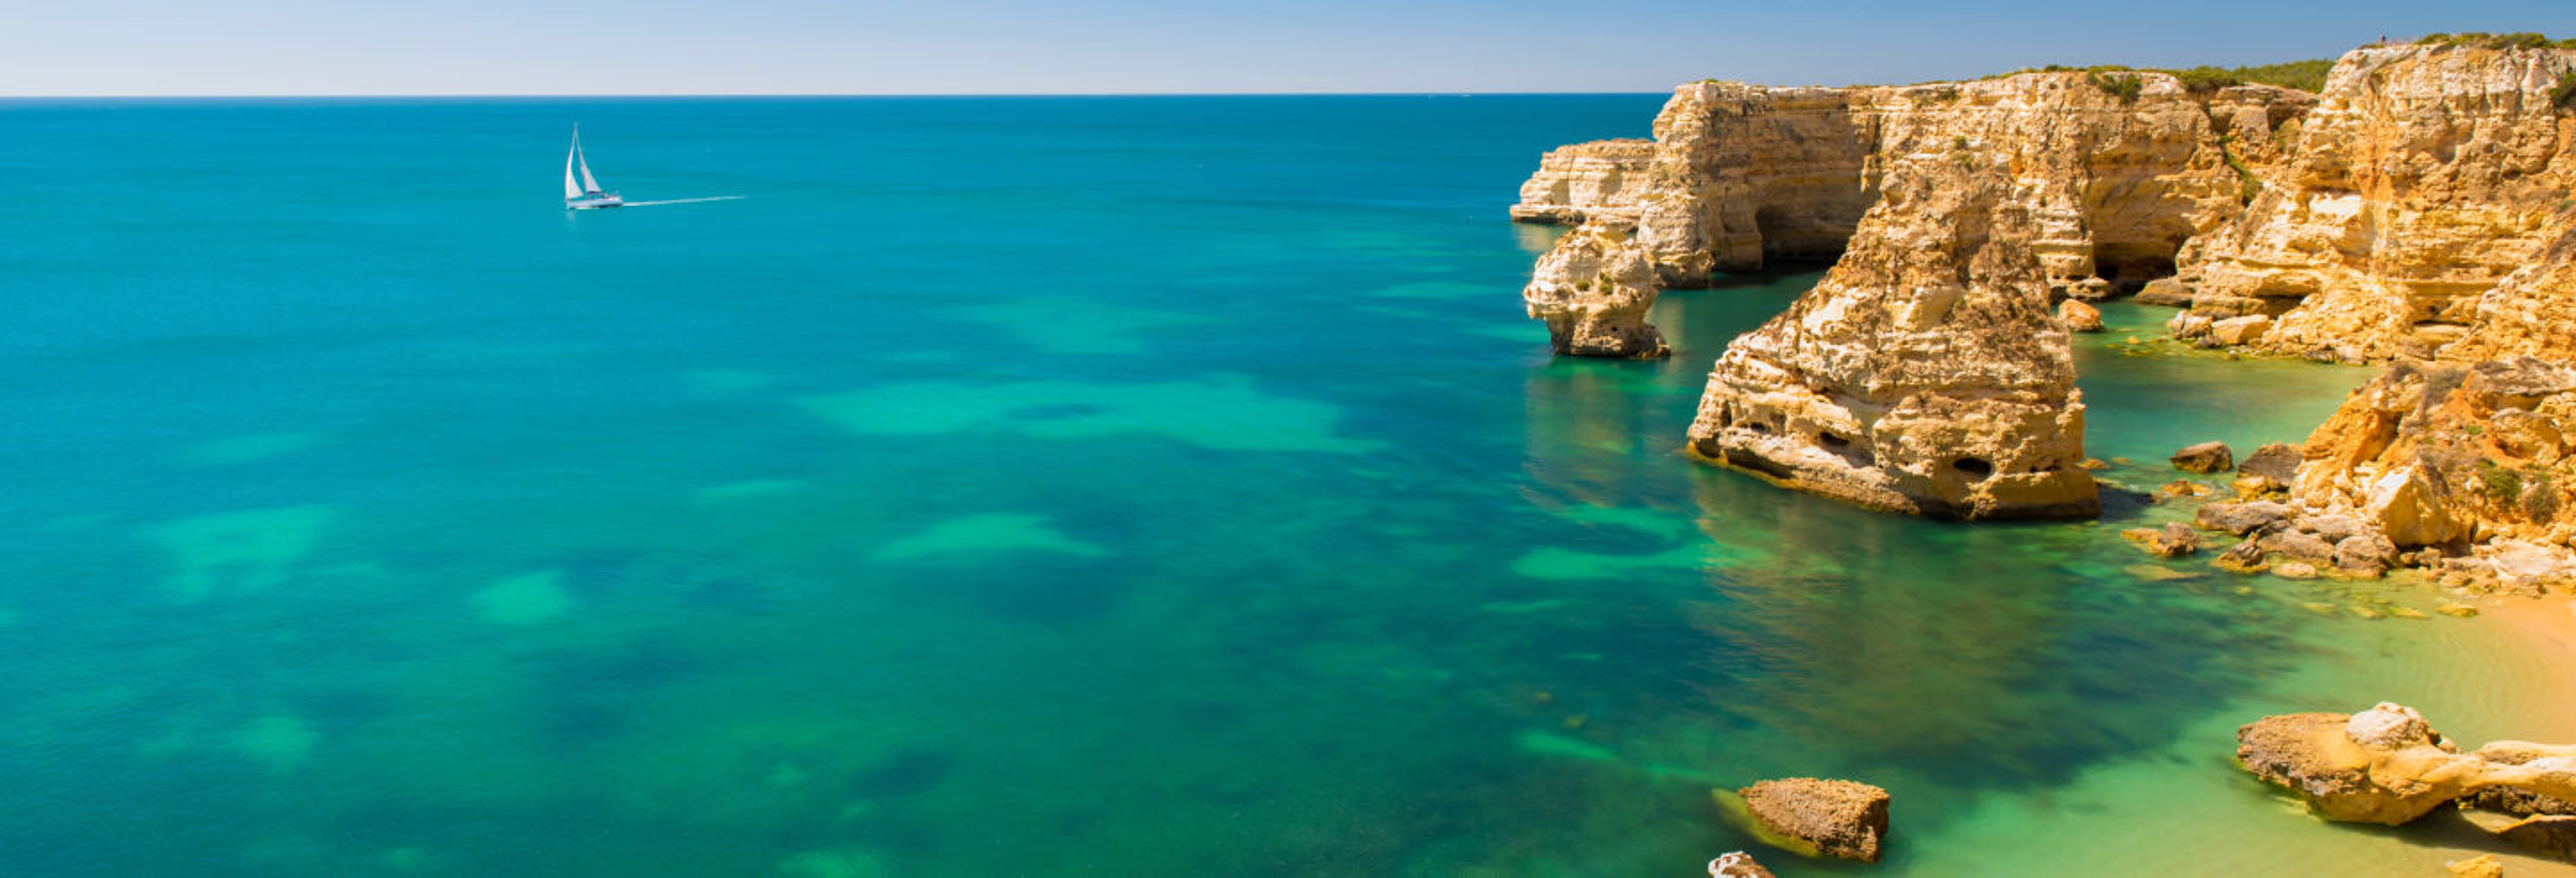 Siete Valles Colgantes + Paseo en barco por Benagil